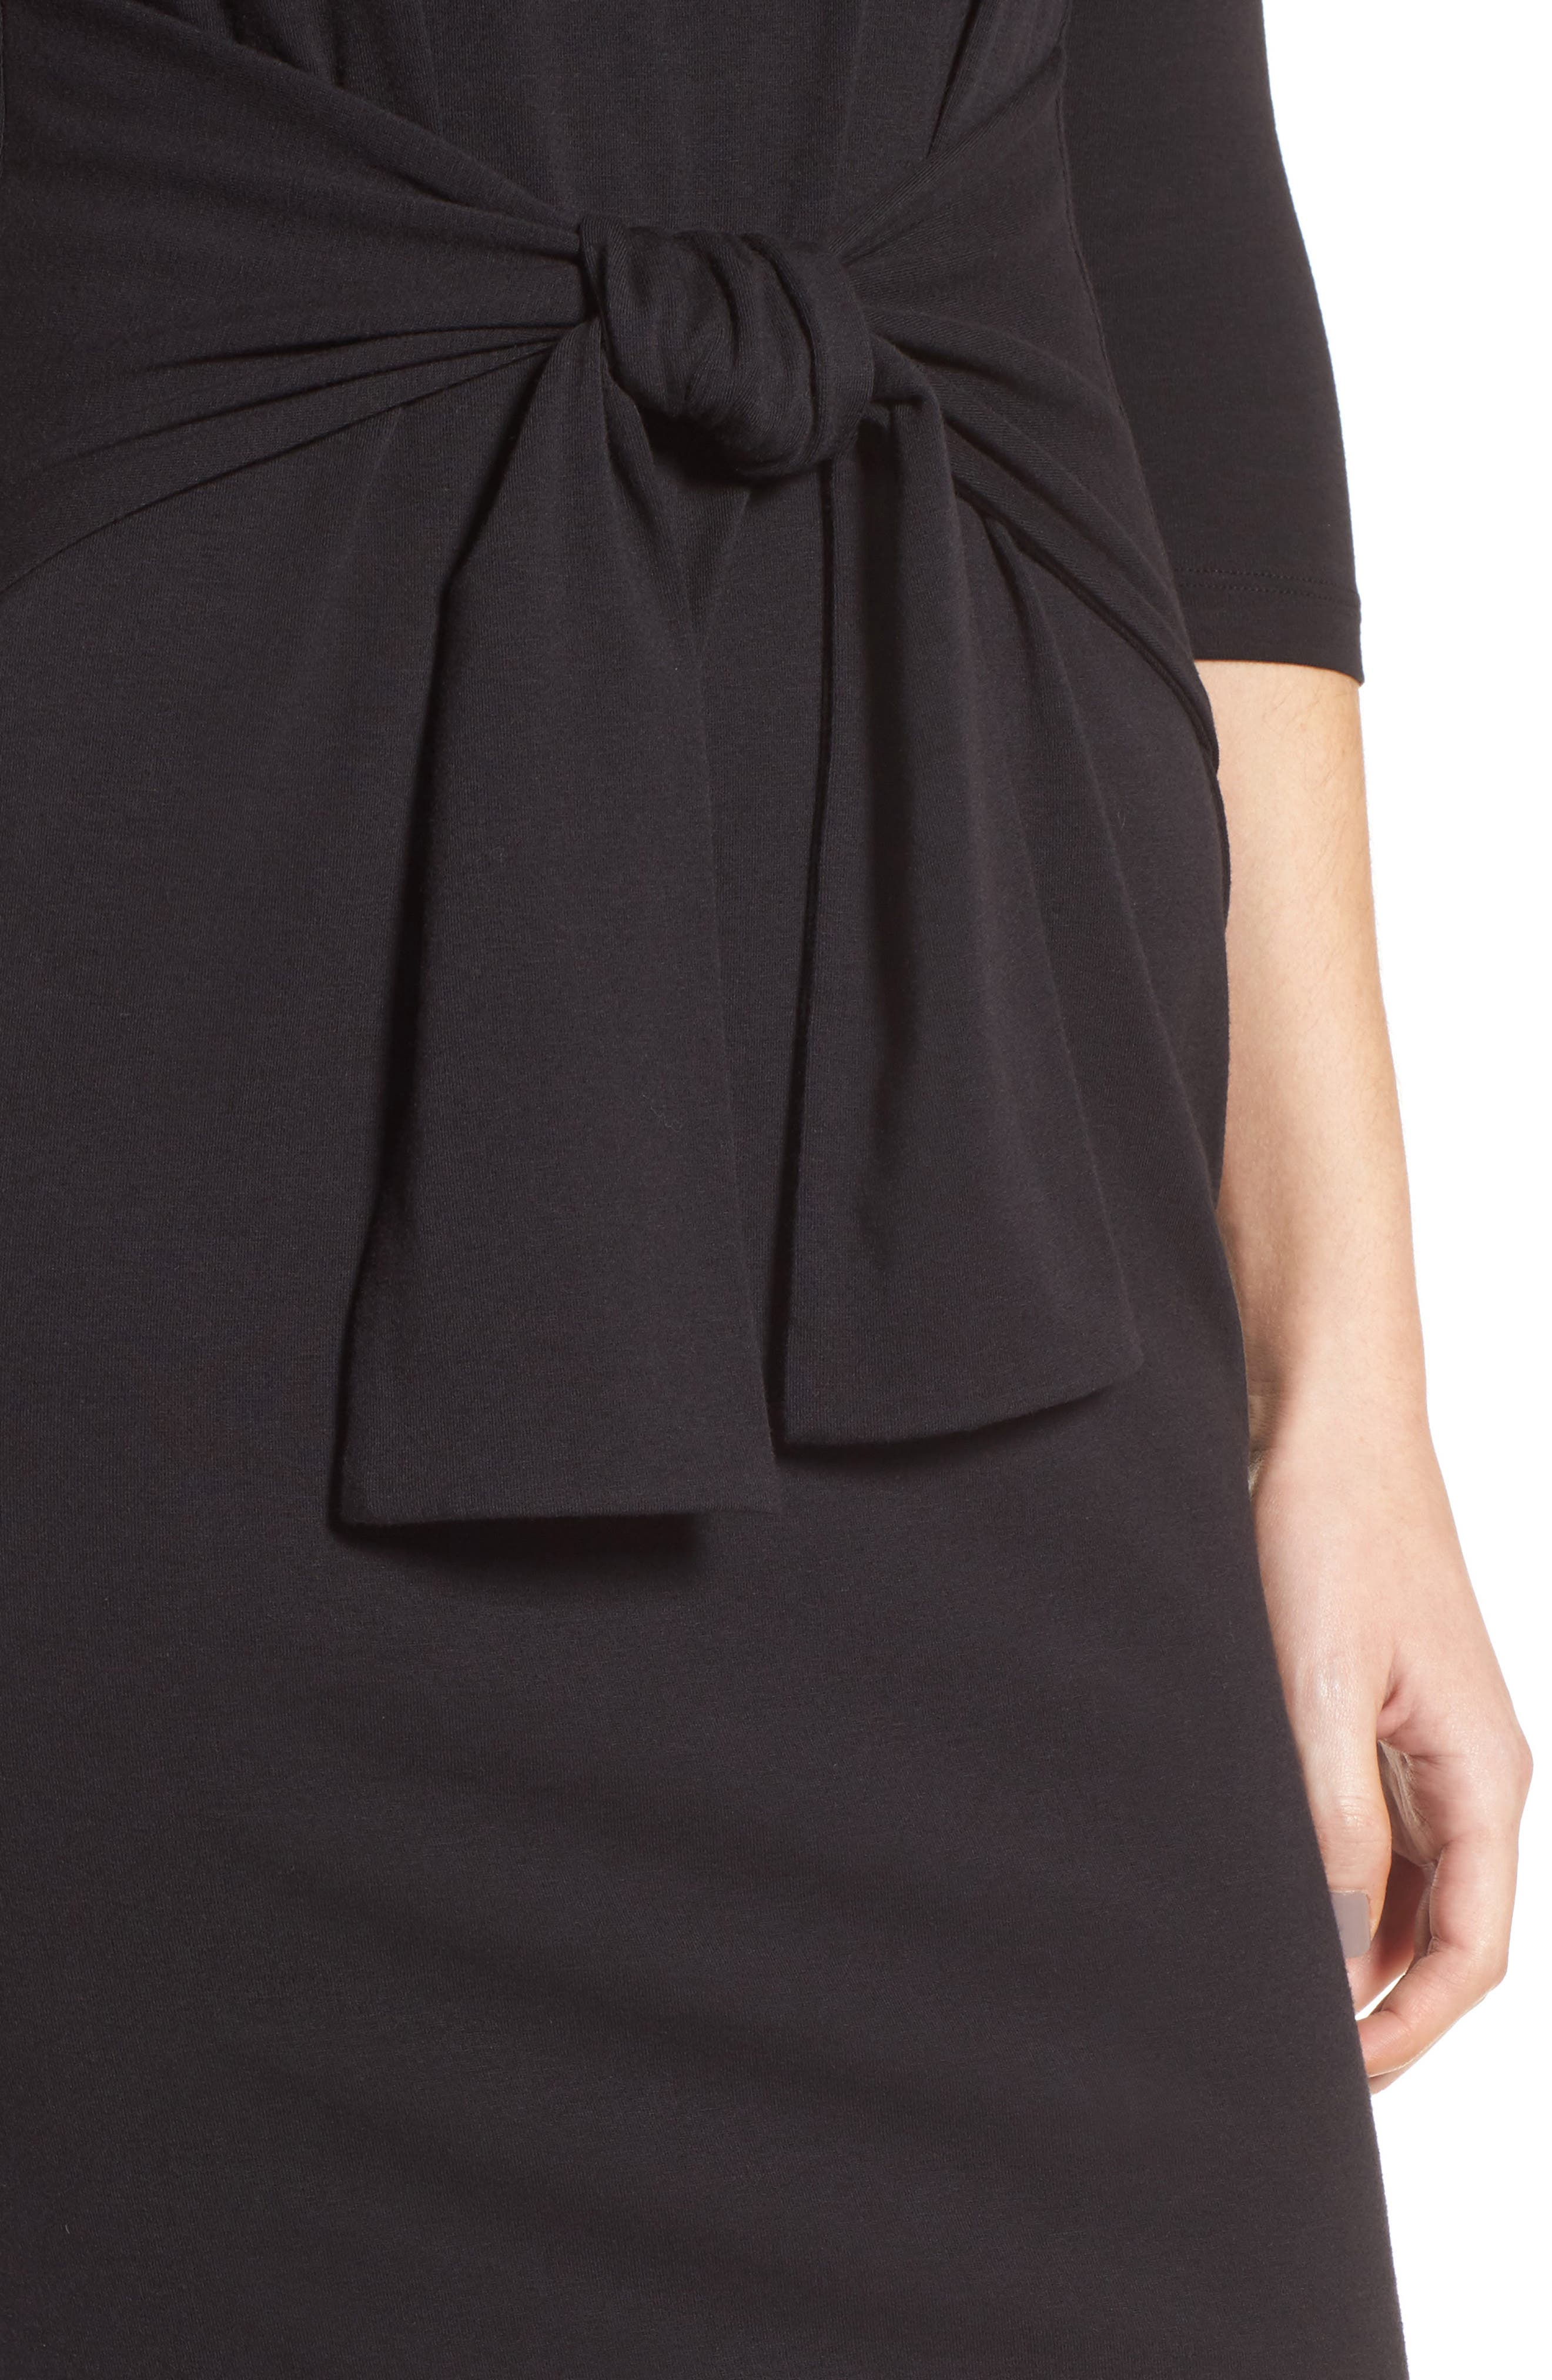 Colombe Knit Sheath Dress,                             Alternate thumbnail 4, color,                             001